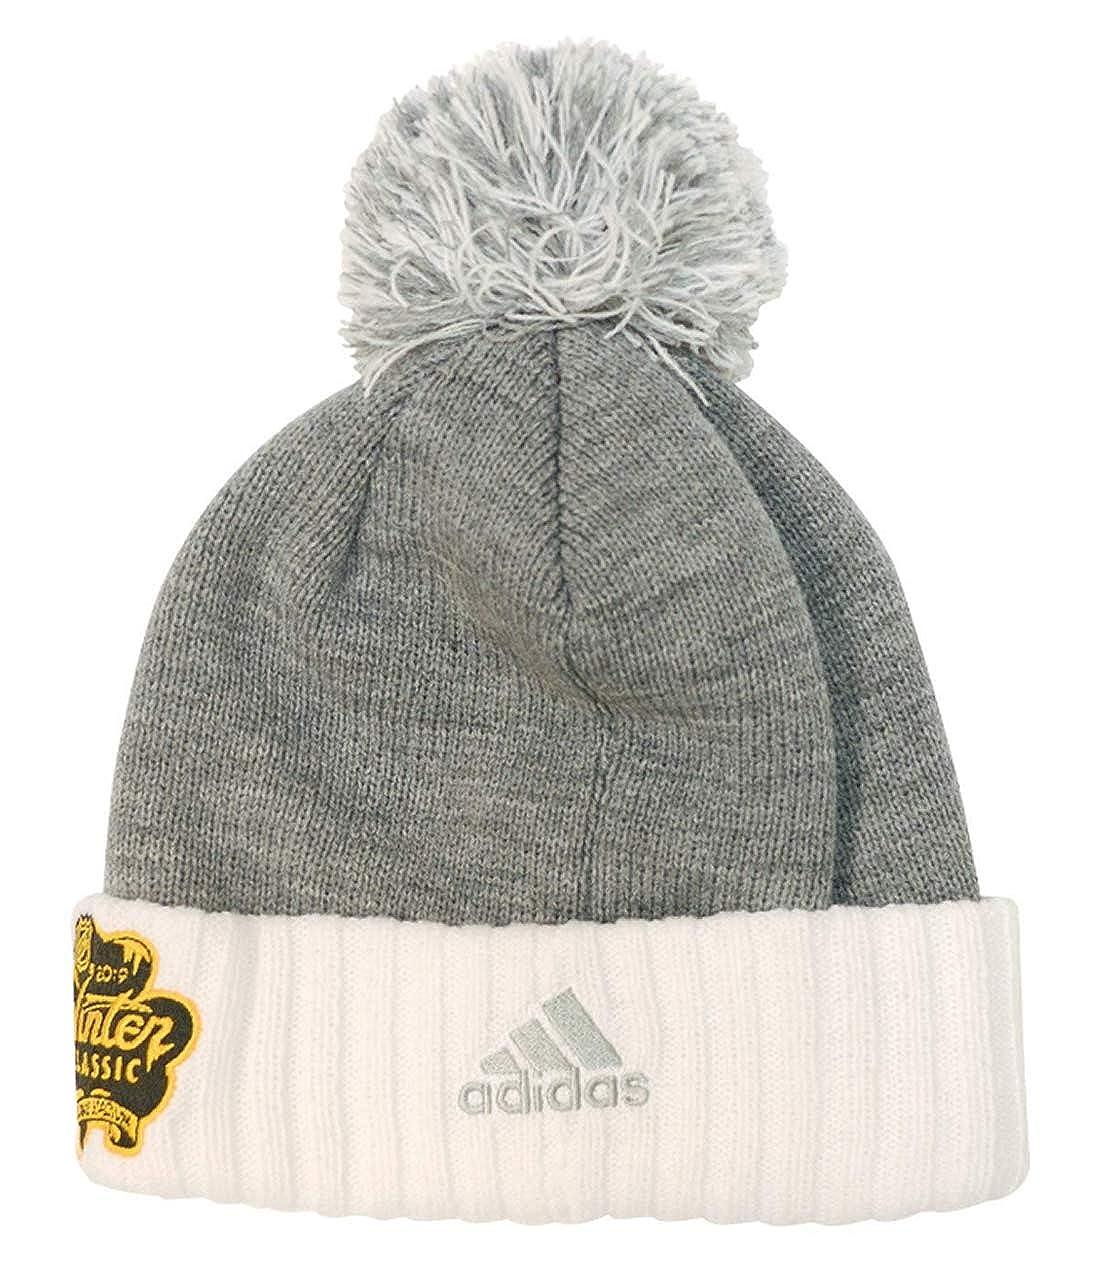 d0d15b530bd197 Amazon.com : adidas Boston Bruins 2019 Winter Classic Cuffed Pom Knit Hat  ... : Clothing